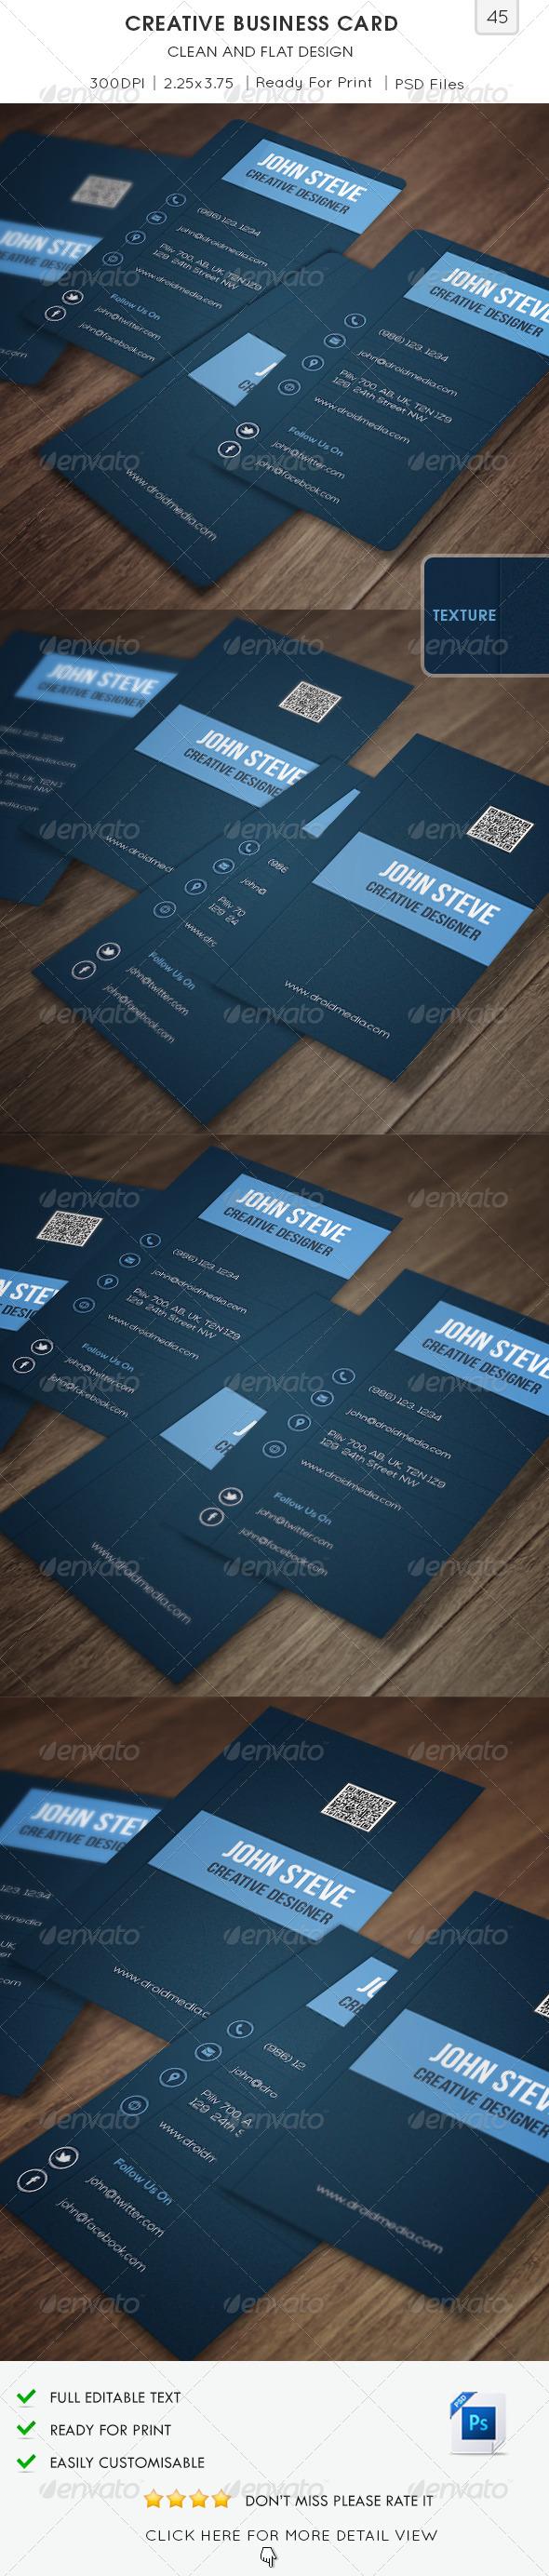 Creative Business Card v45